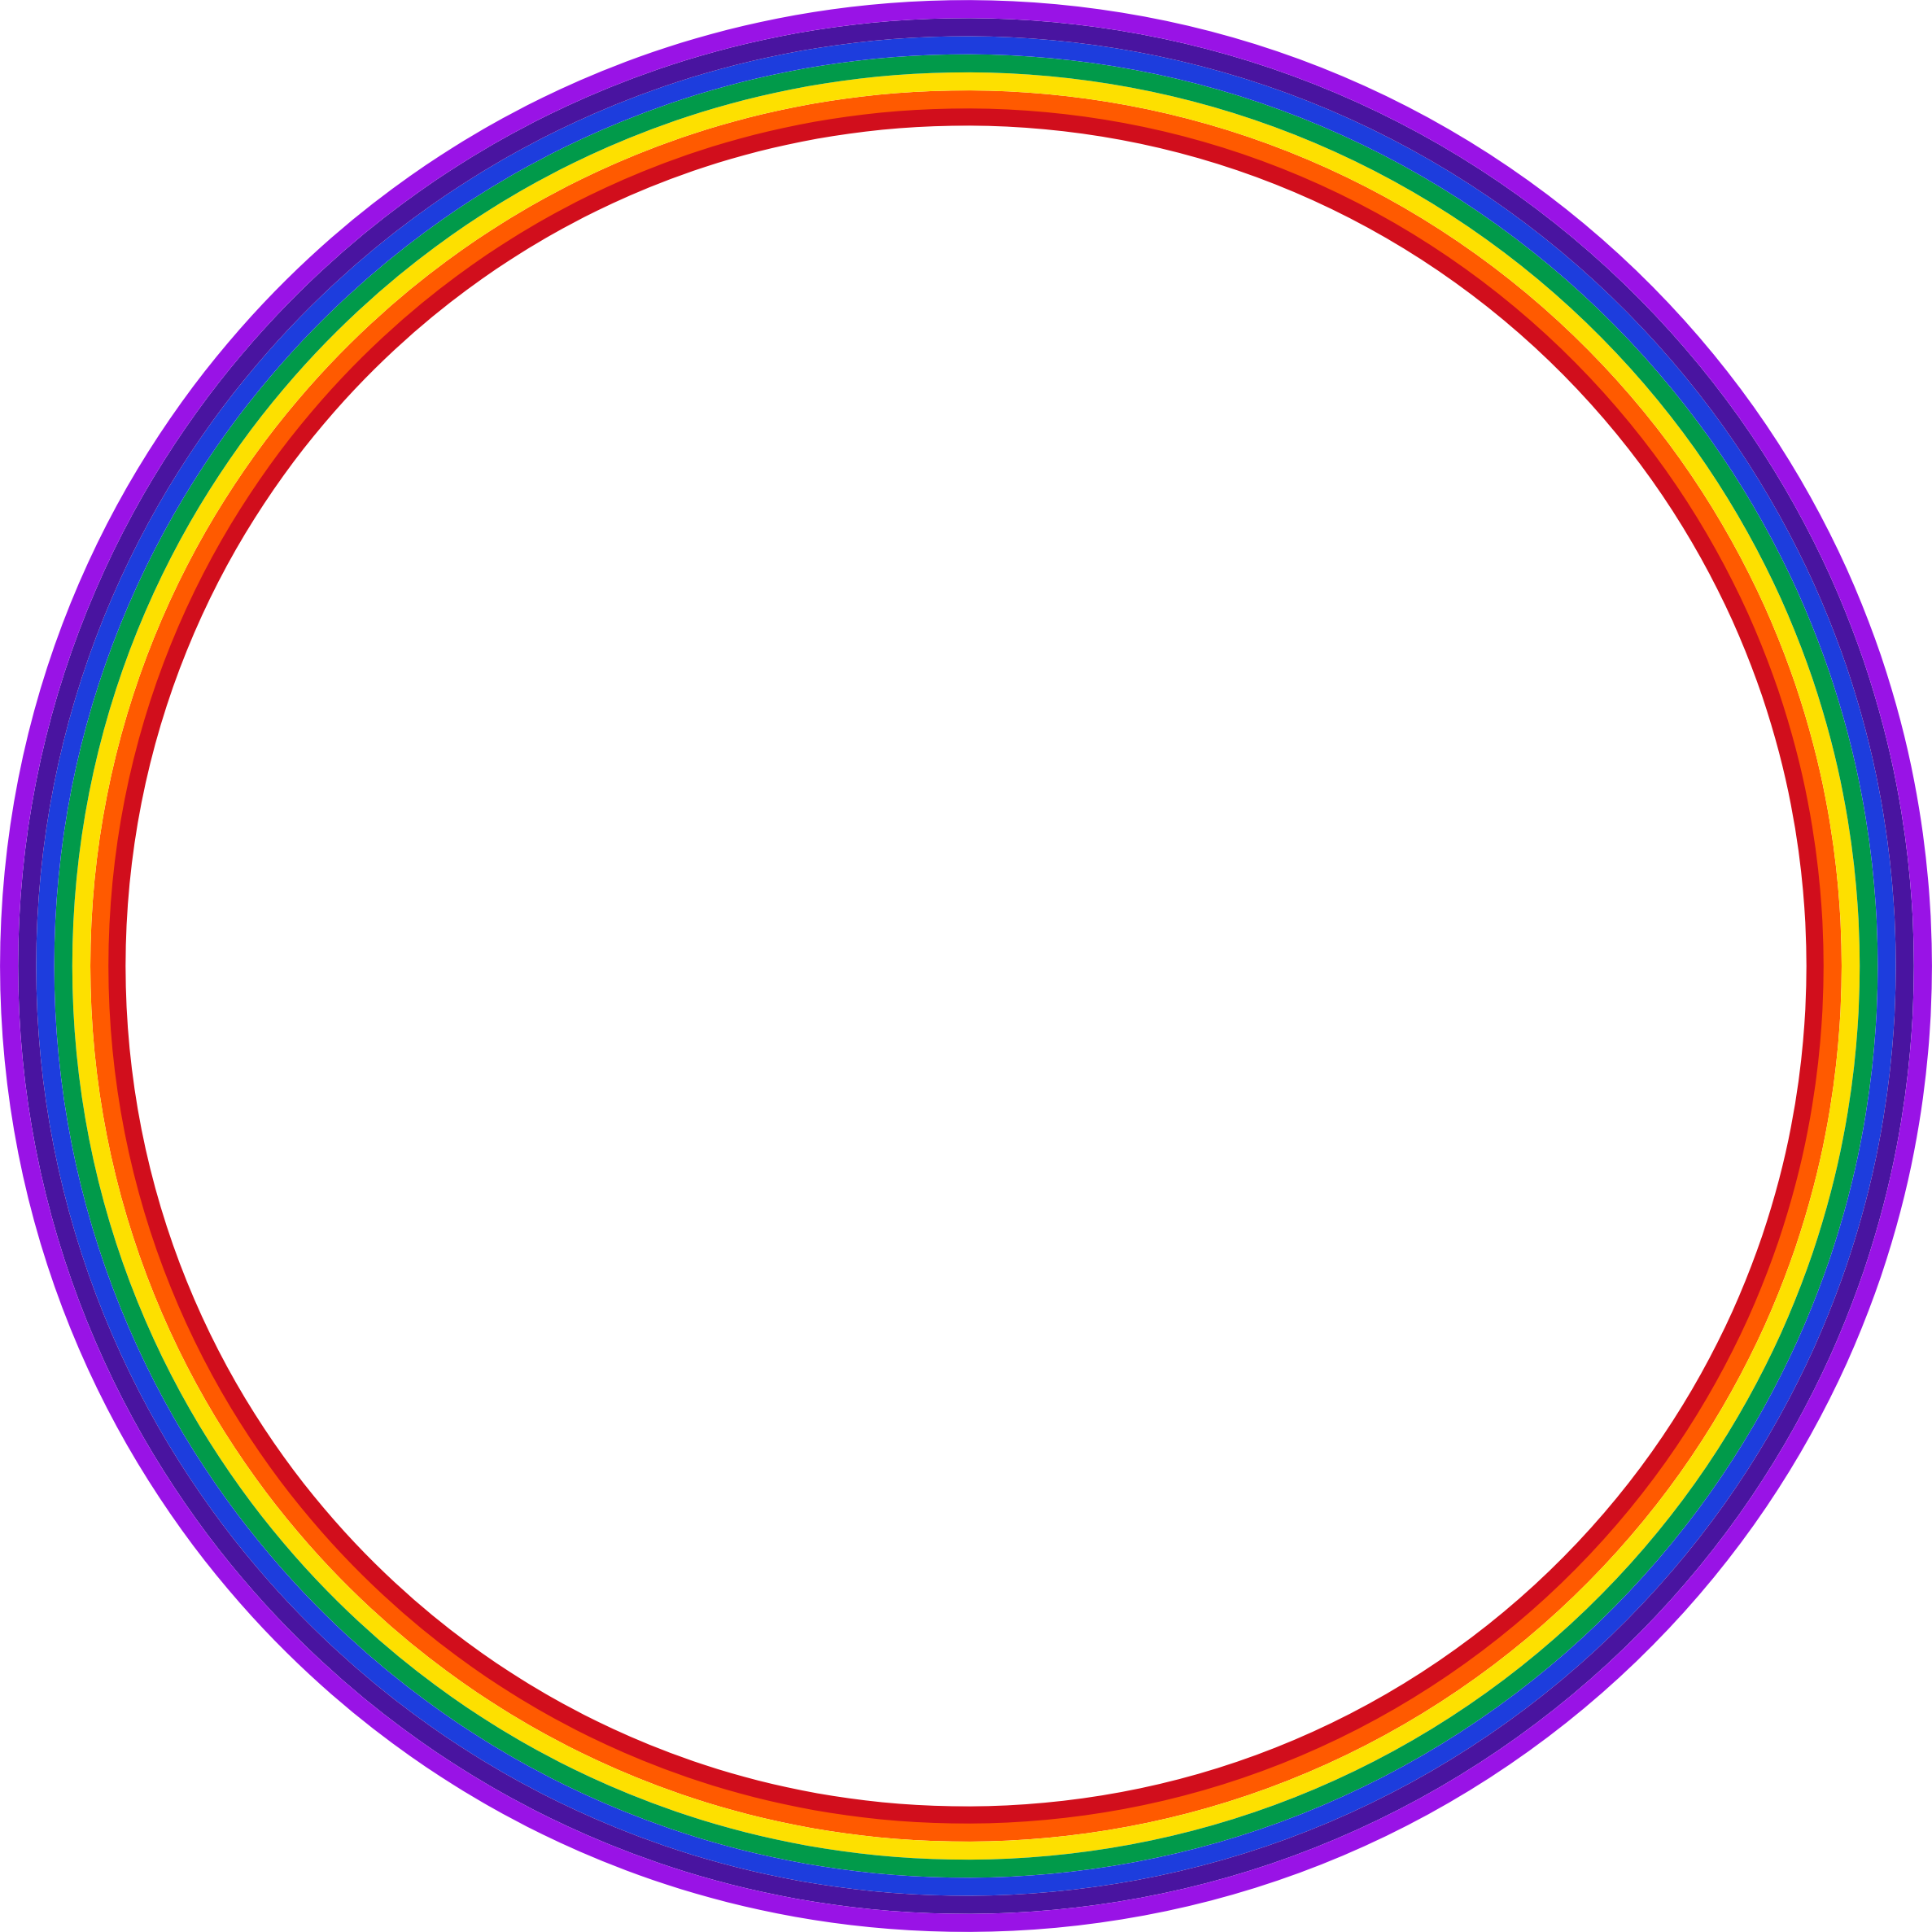 Clipart Rainbow Circle 2